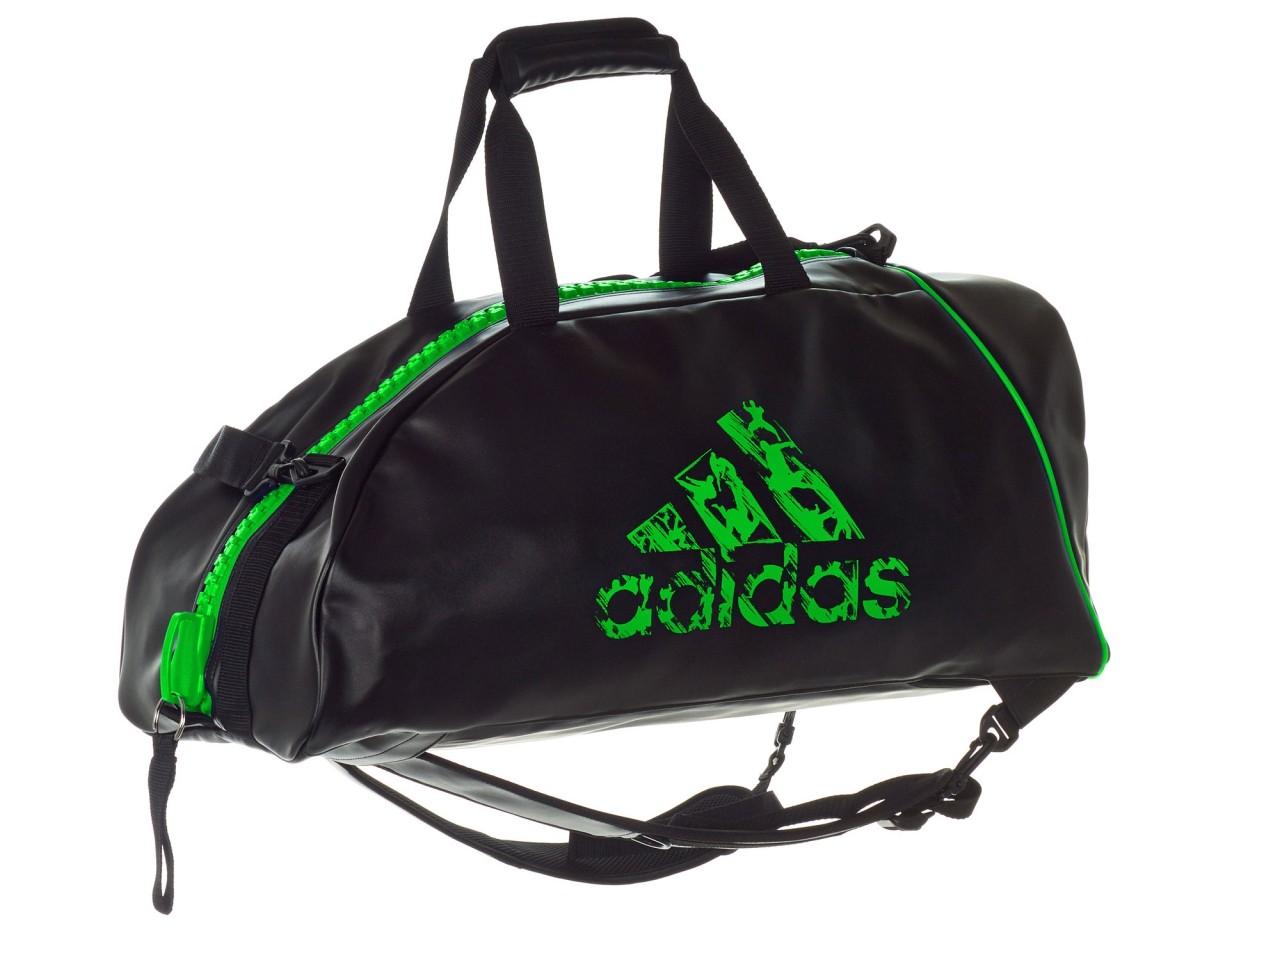 Torba plecak Adidas, 6 kolorów